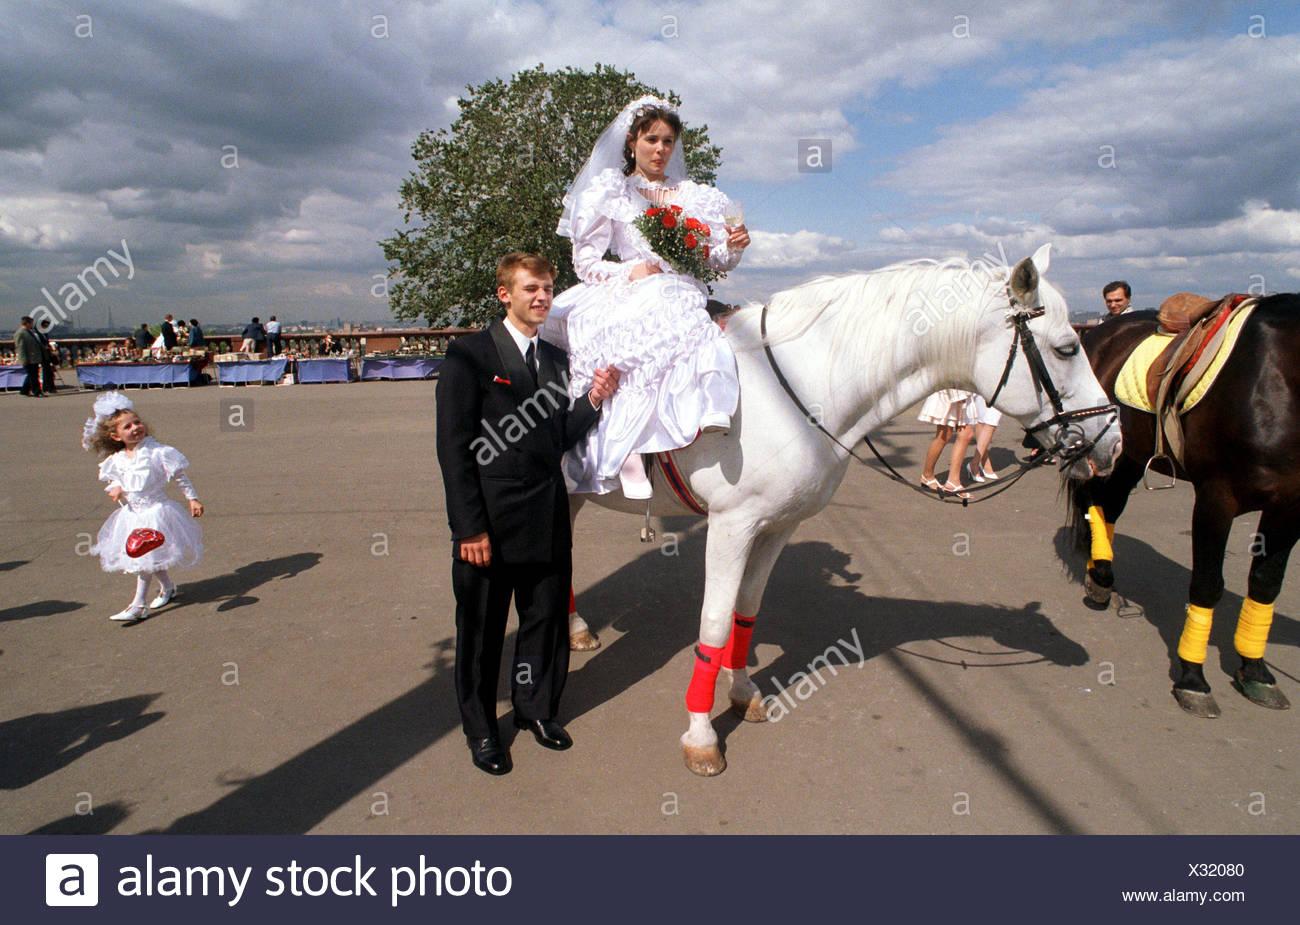 Wedding Couple Bride Sitting On A White Horse Stock Photo Alamy